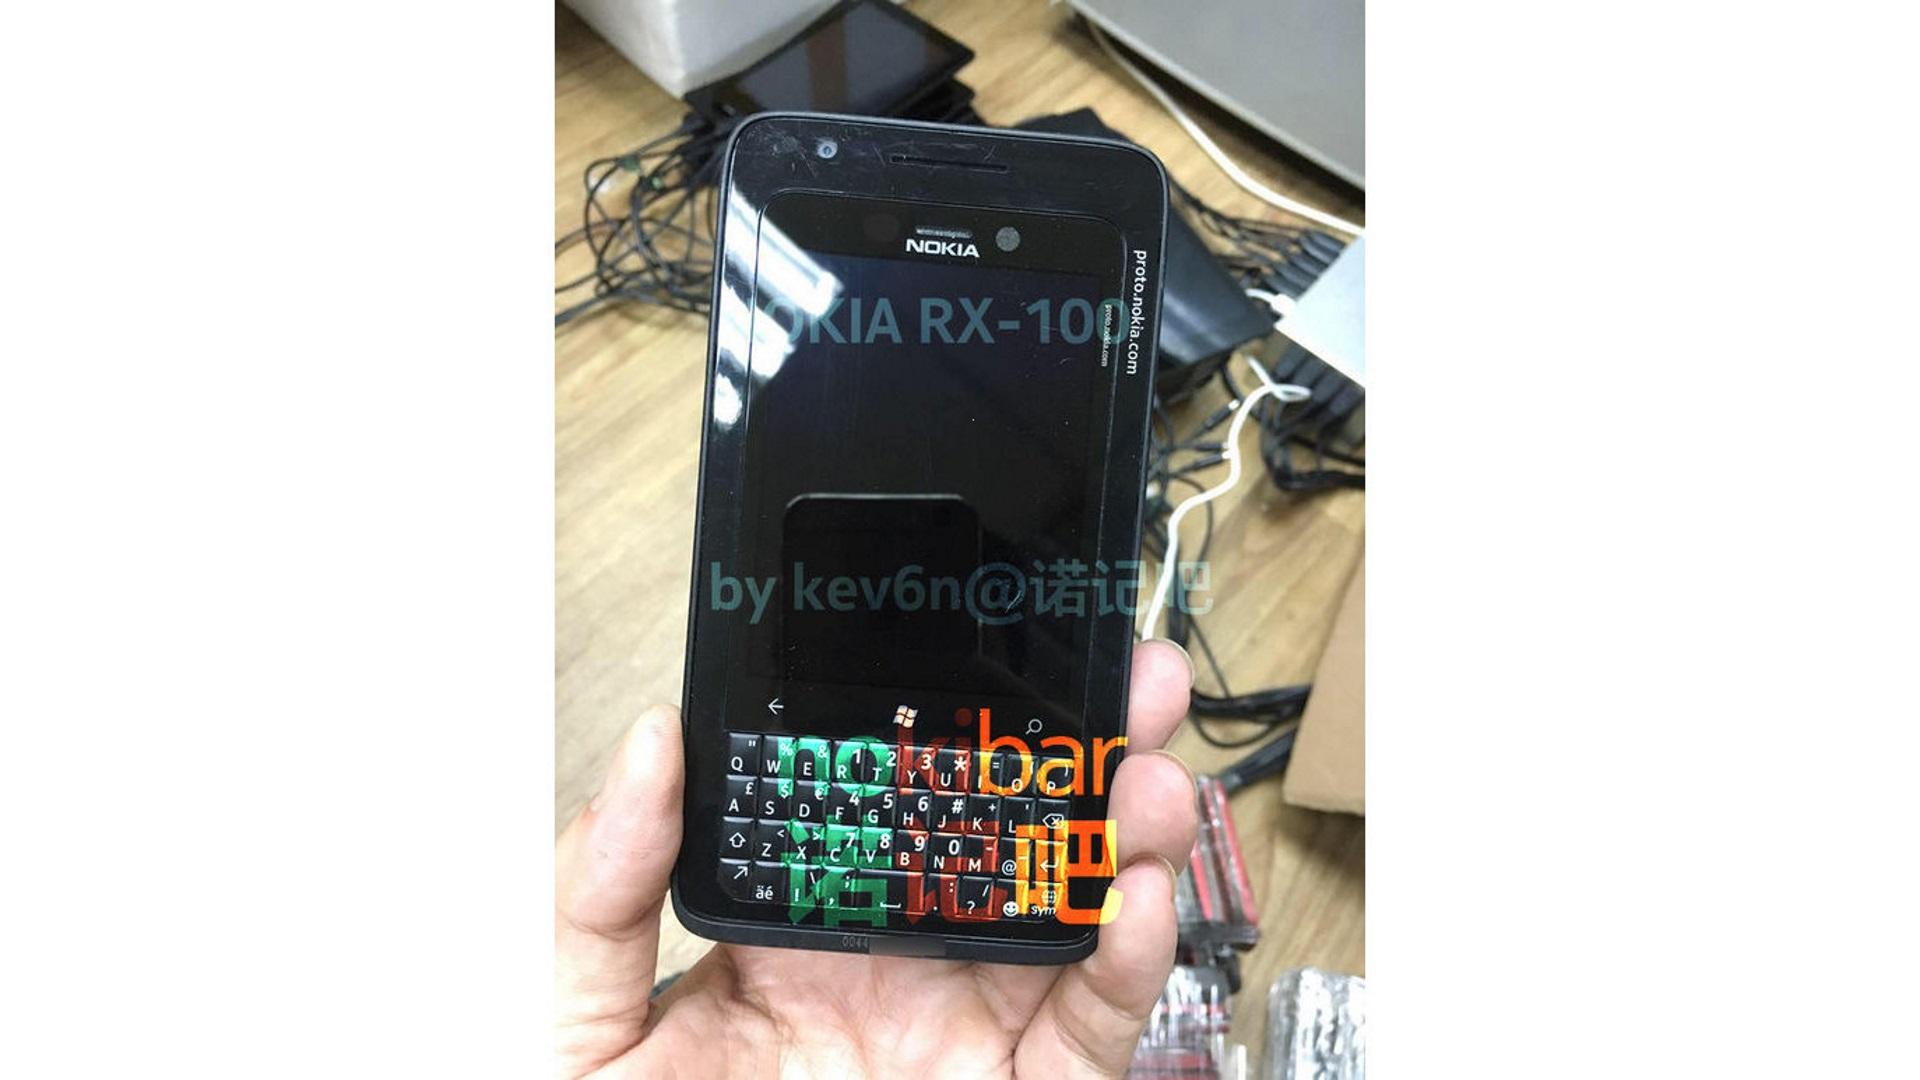 KEYone型キーボードを搭載するNokia製プロトタイプスマートフォンの写真